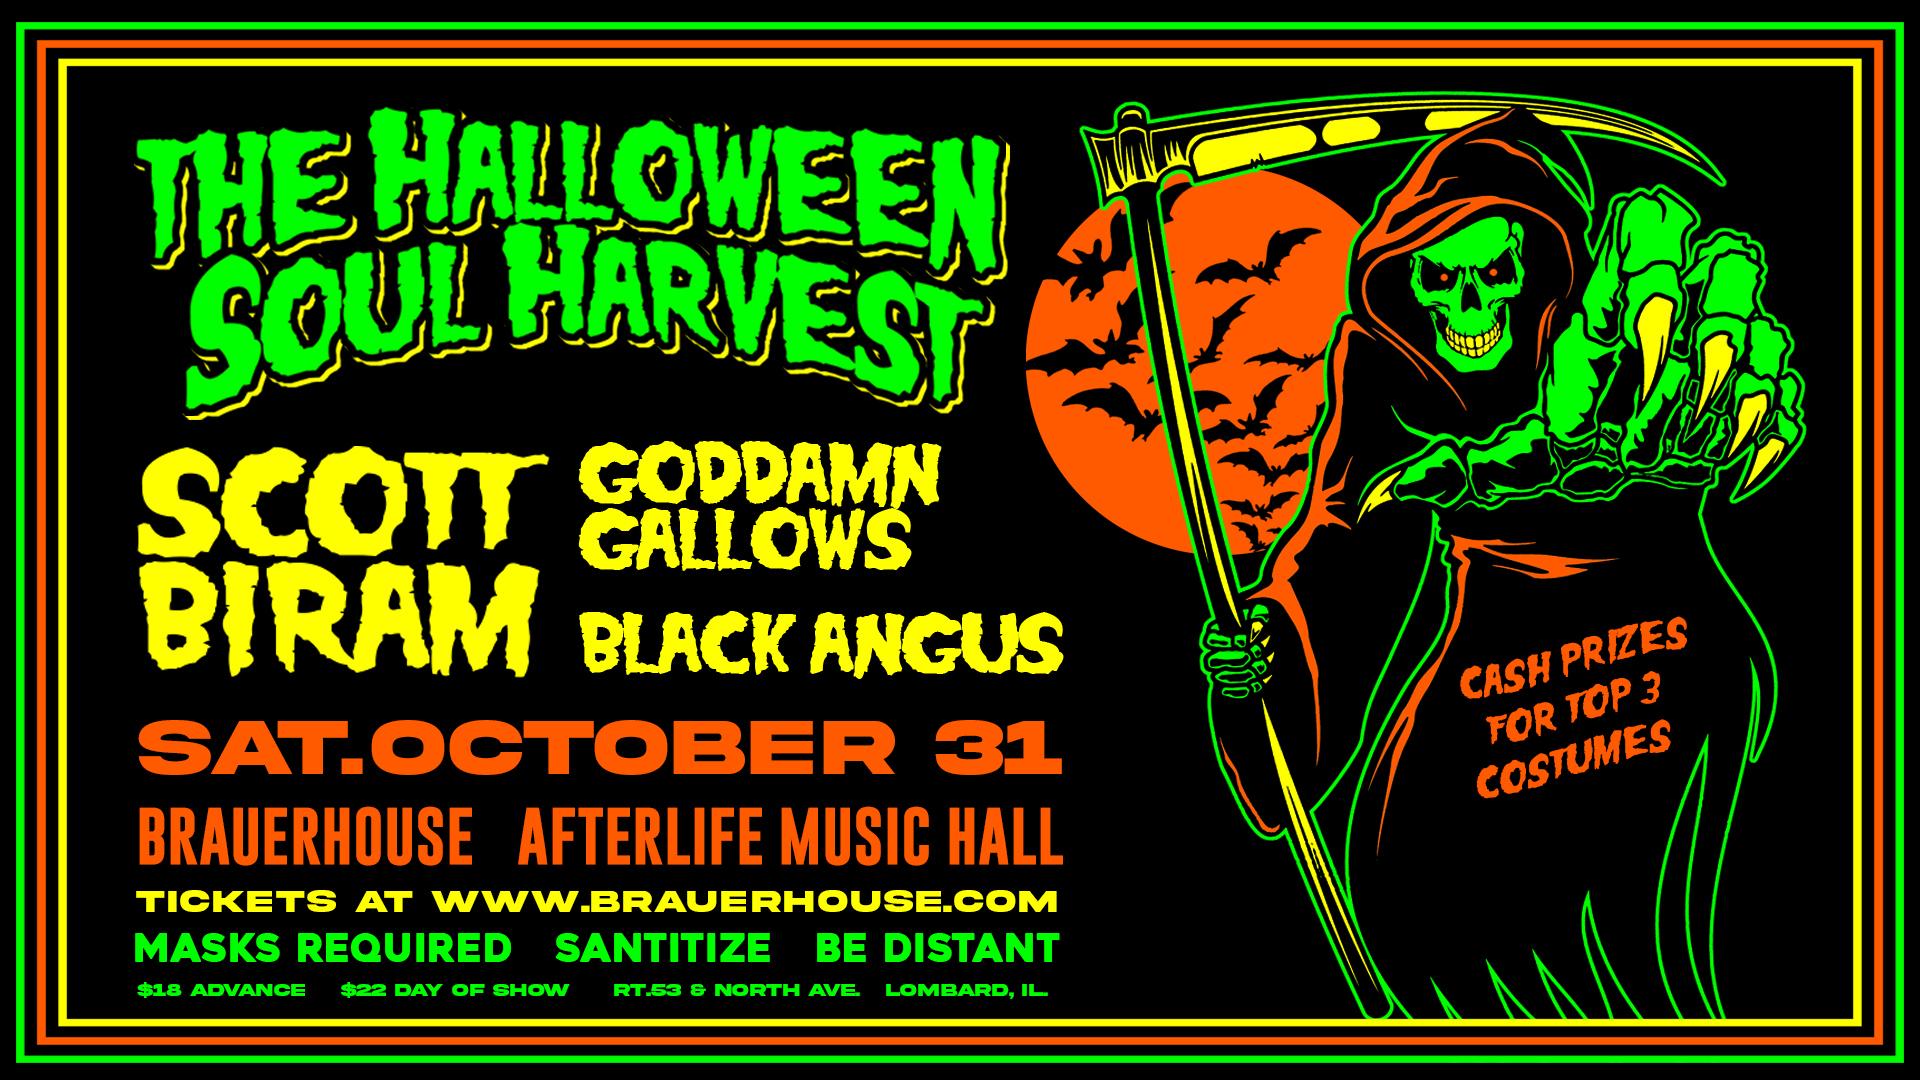 The Halloween Soul Harvest W/ Scoot Biram and Goddamn Gallows